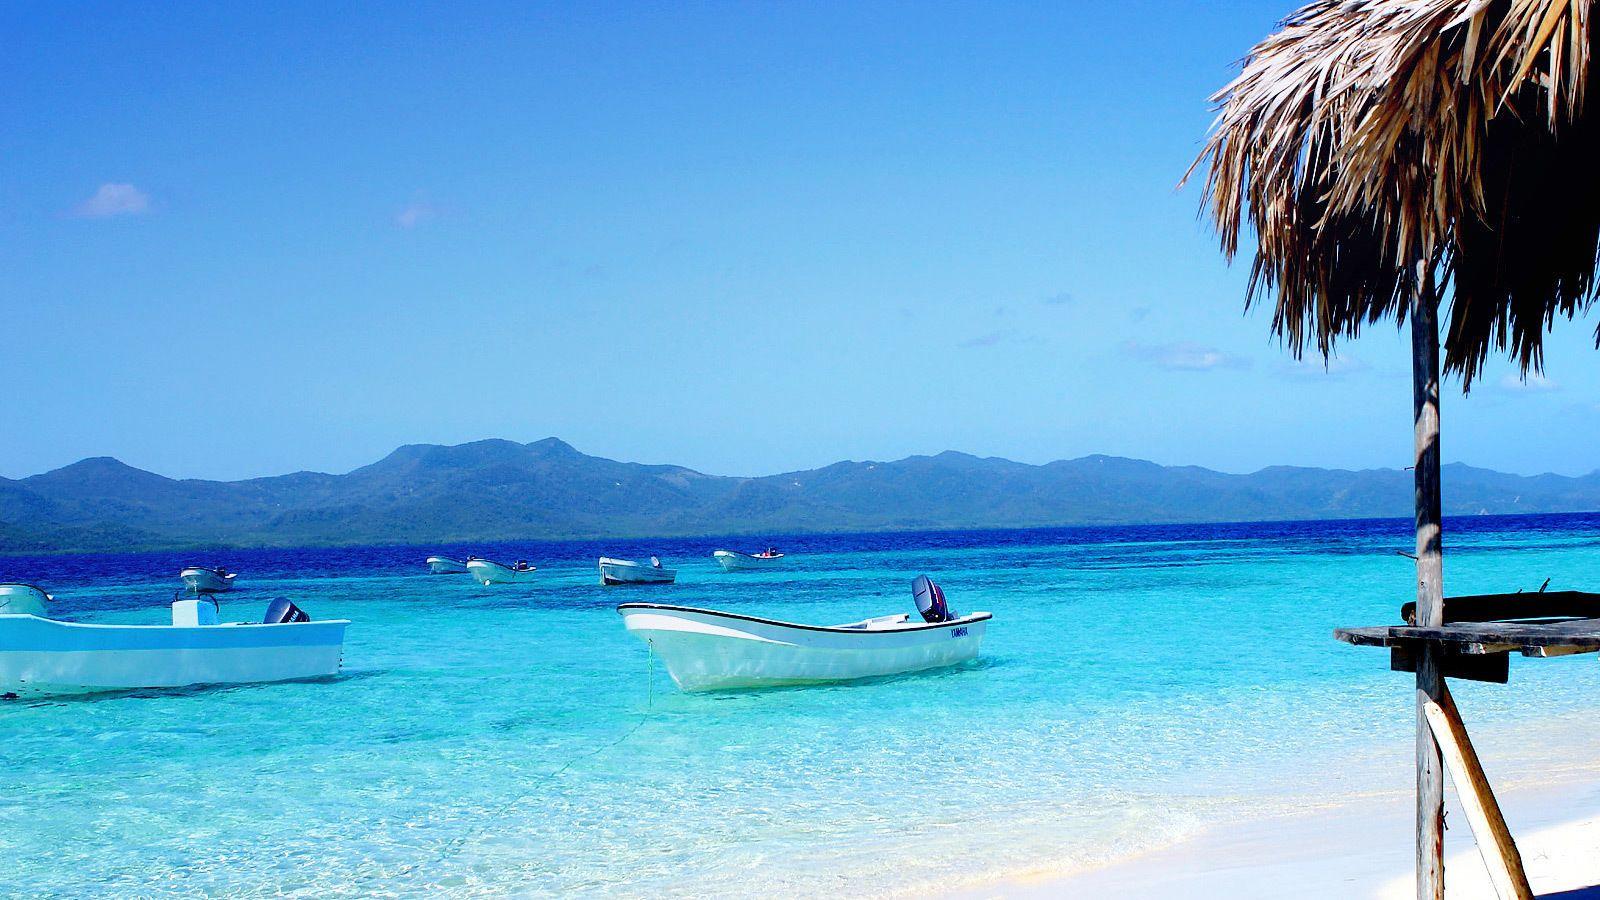 Moored boats off the coast of Paradise Island